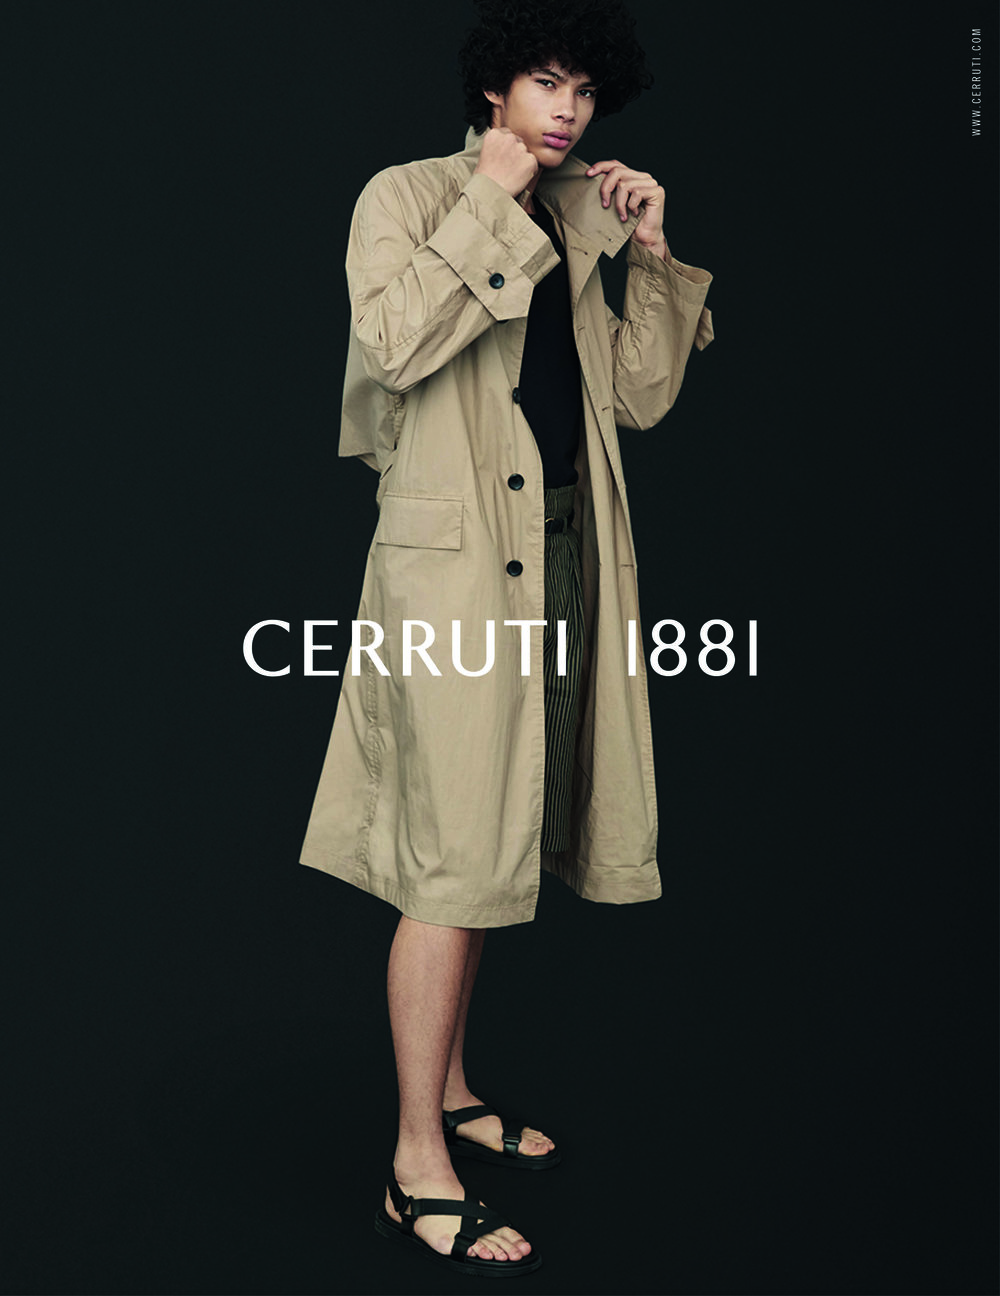 Cerruti - 5.jpg